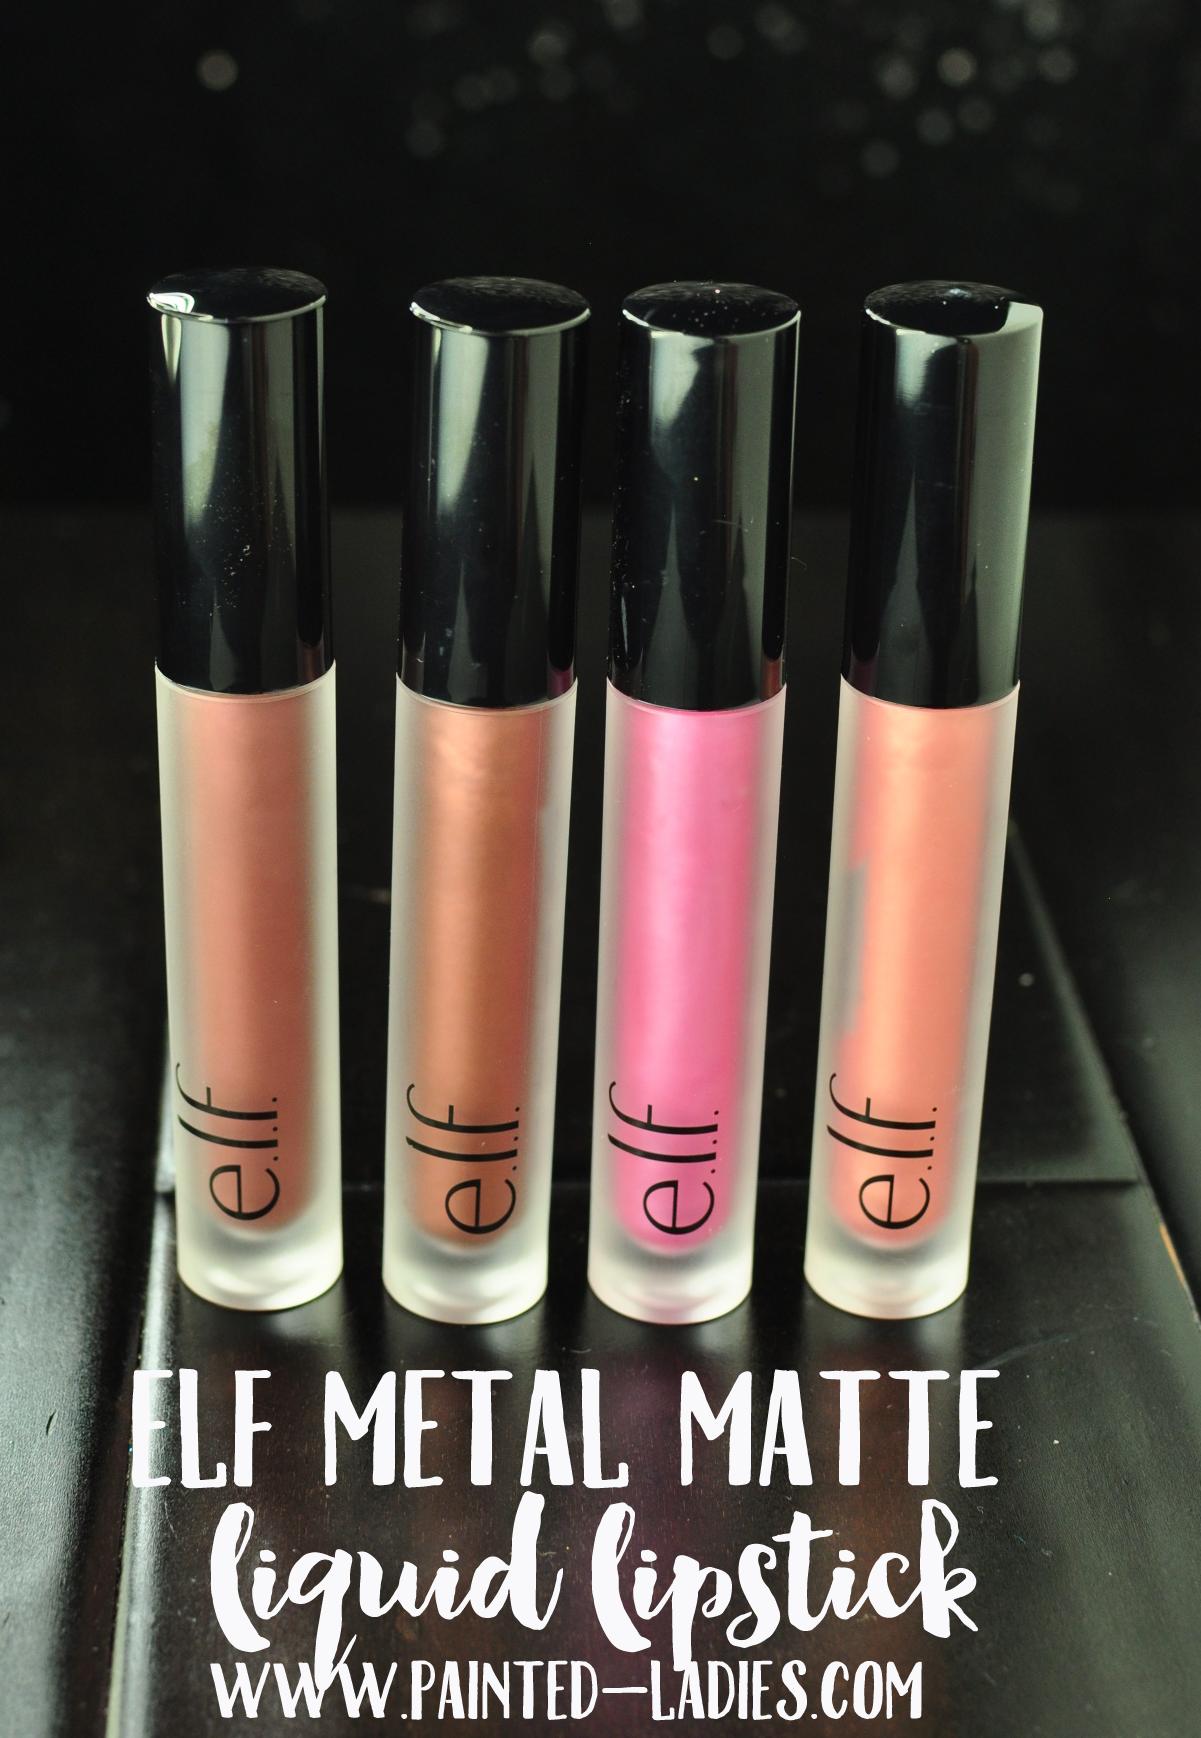 elf Cosmetics Metal Matte Liquid Lipsticks | Makeup Love | Pinterest ...